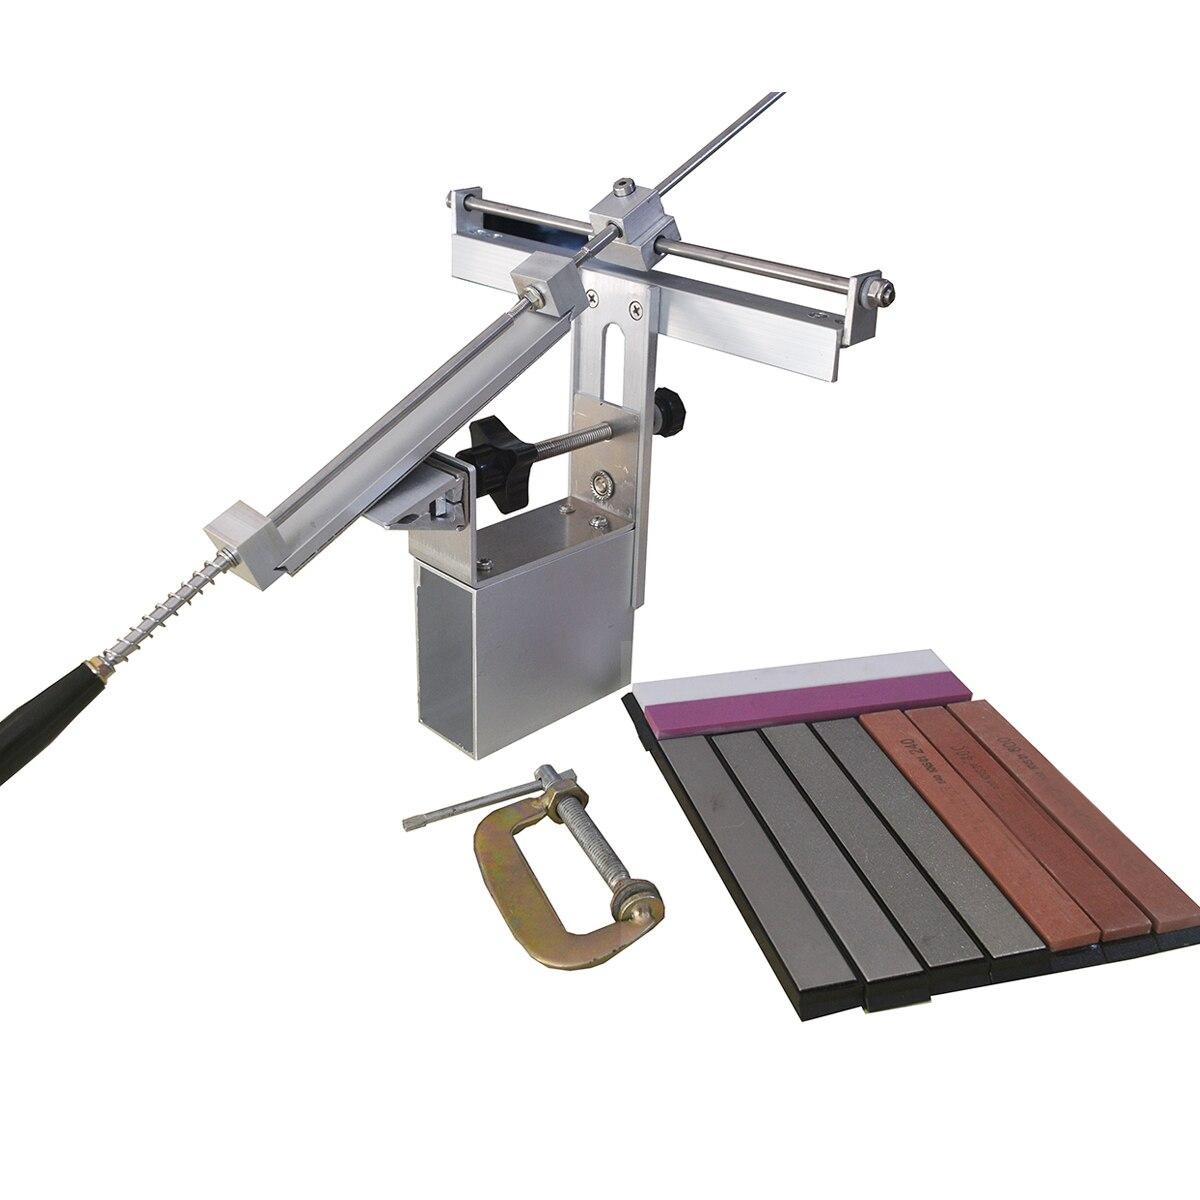 Kitchen Knife Sharpener System Update Professional Pro Apex Afilador Cuchillo Ferramentas KME Diamond Whetstone